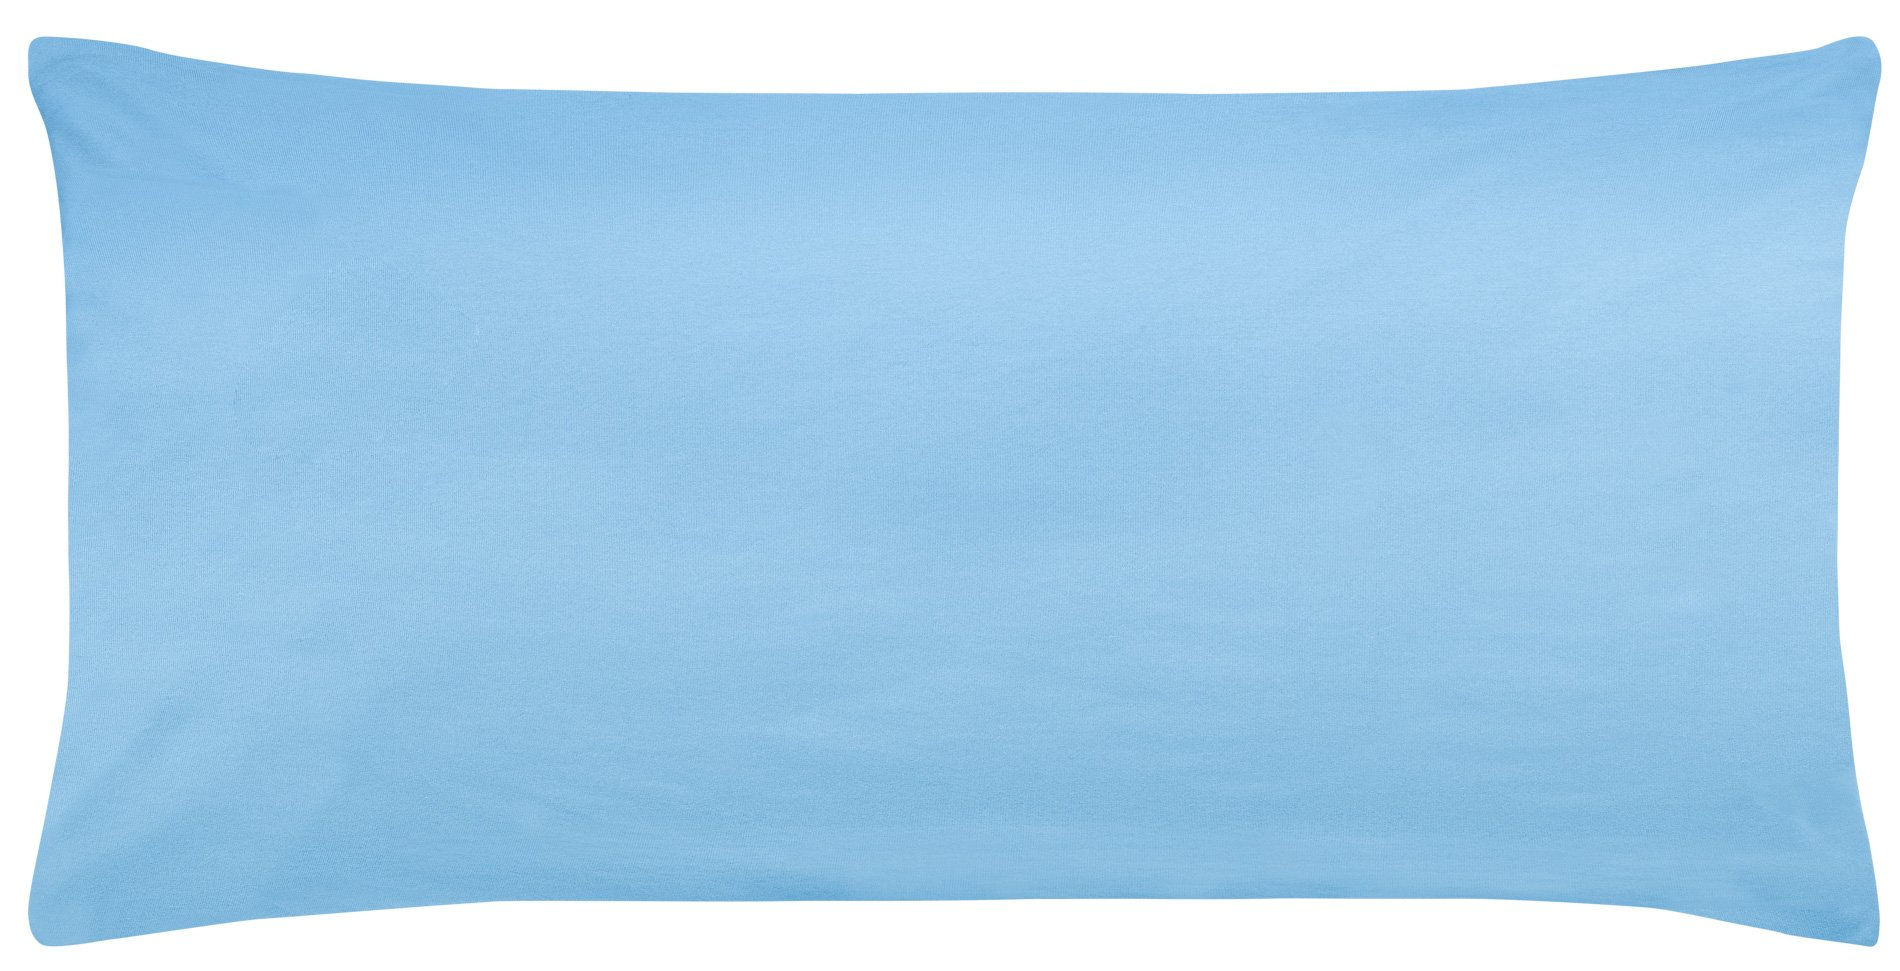 K.-Bezug hellblau 40x80cm